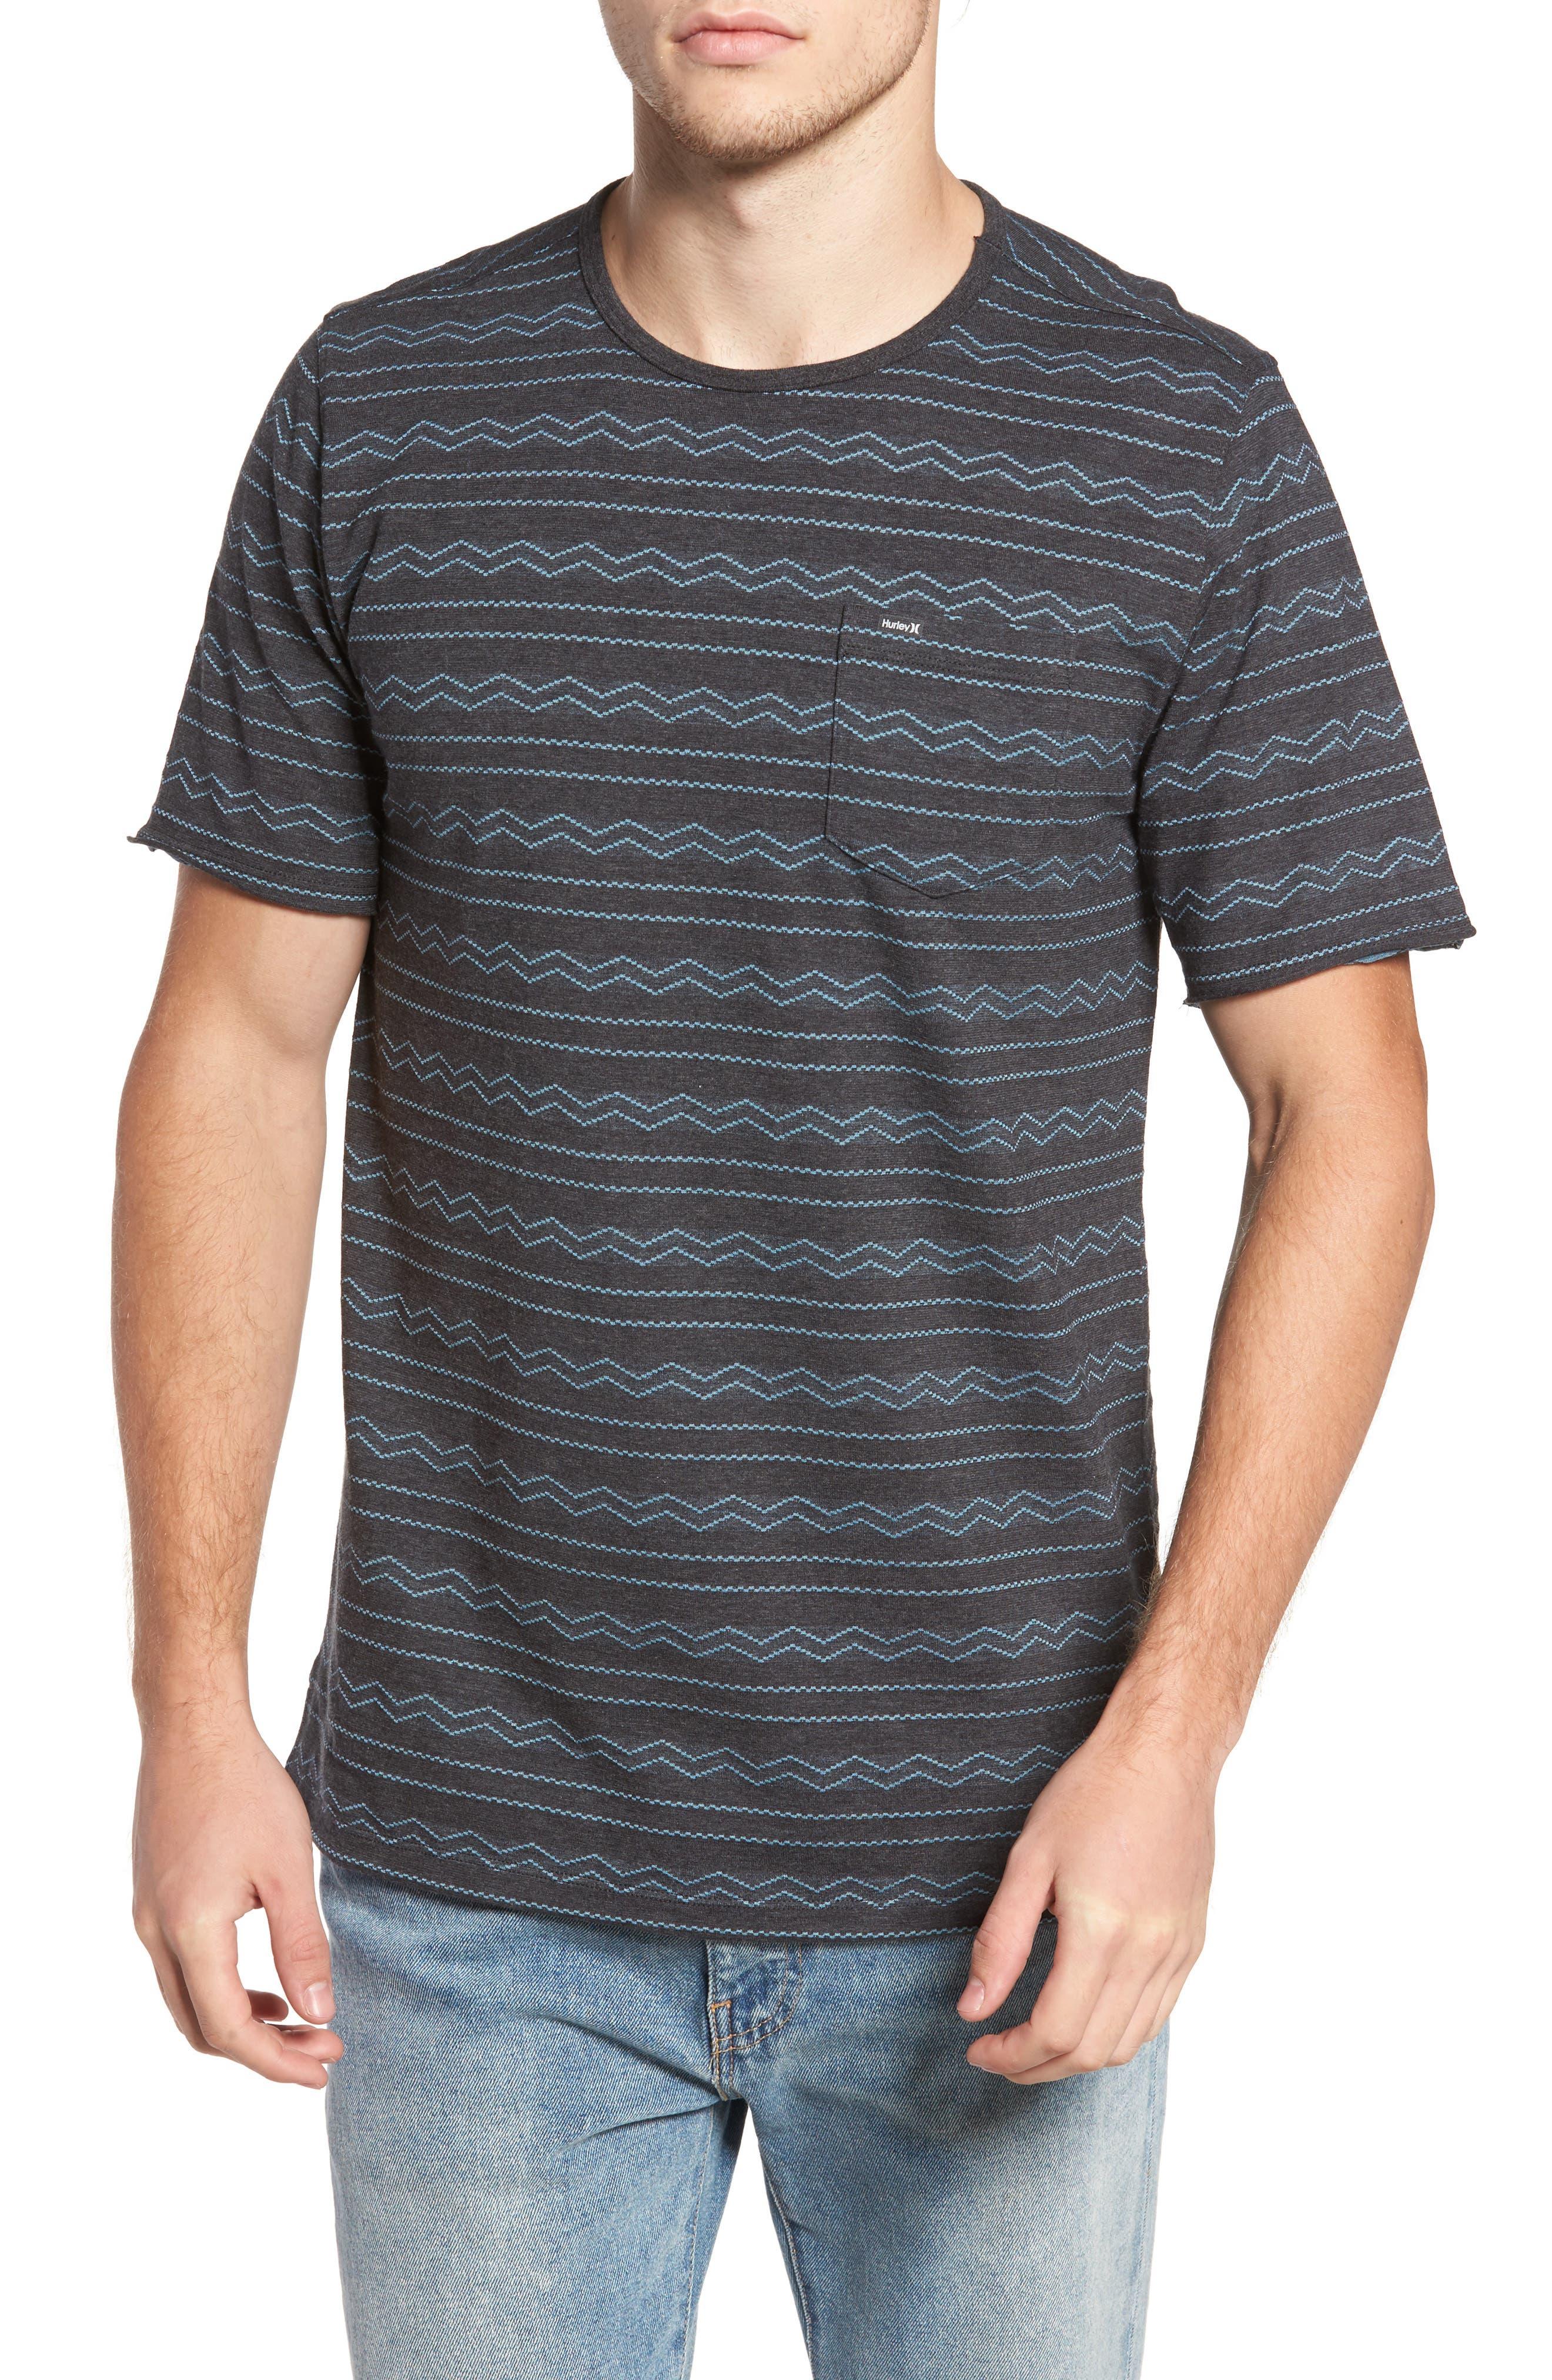 Pismo Dri-FIT T-Shirt,                         Main,                         color, 007